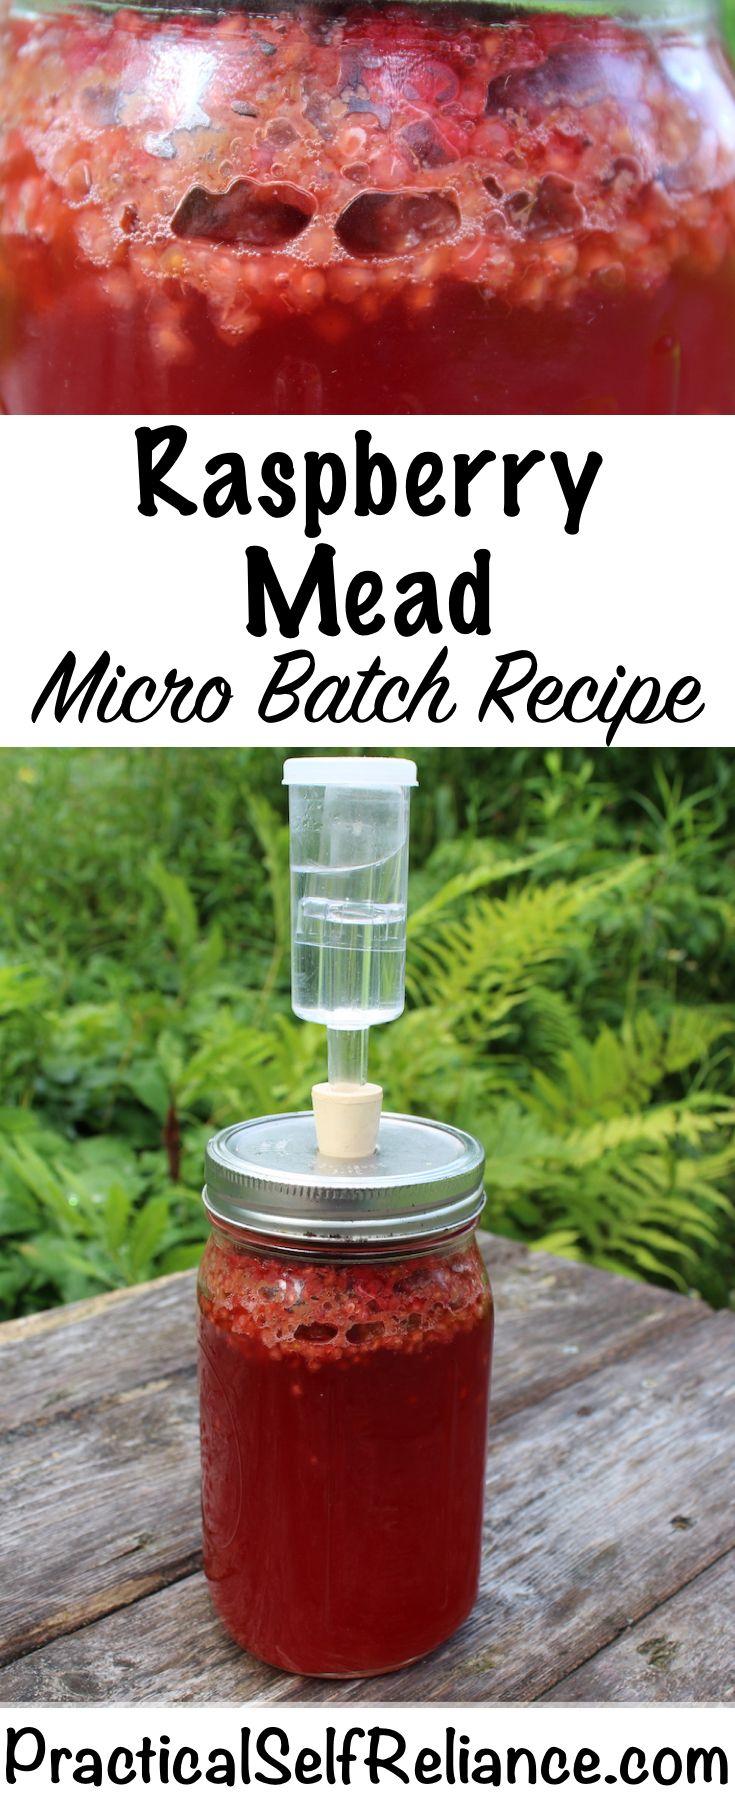 Raspberry Mead Micro Batch Recipe Wine Recipes Mead Recipe Recipes